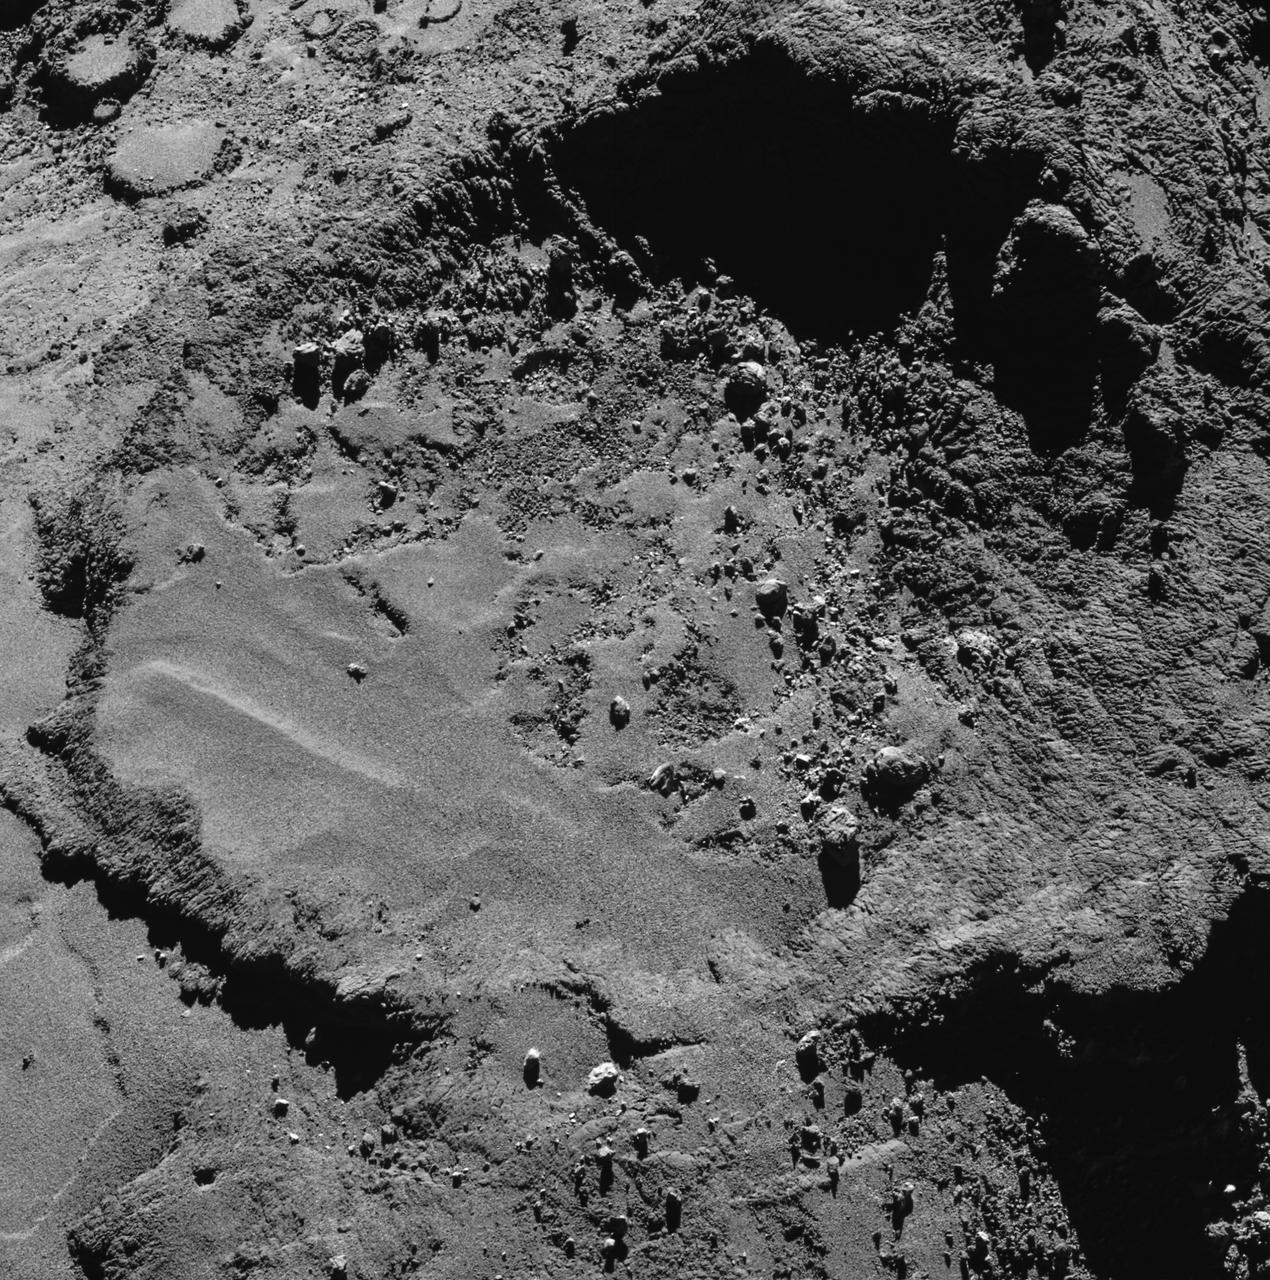 1567215175573-ESA_Rosetta_OSIRIS_NAC_Plume_20160503_crop_1280.jpg